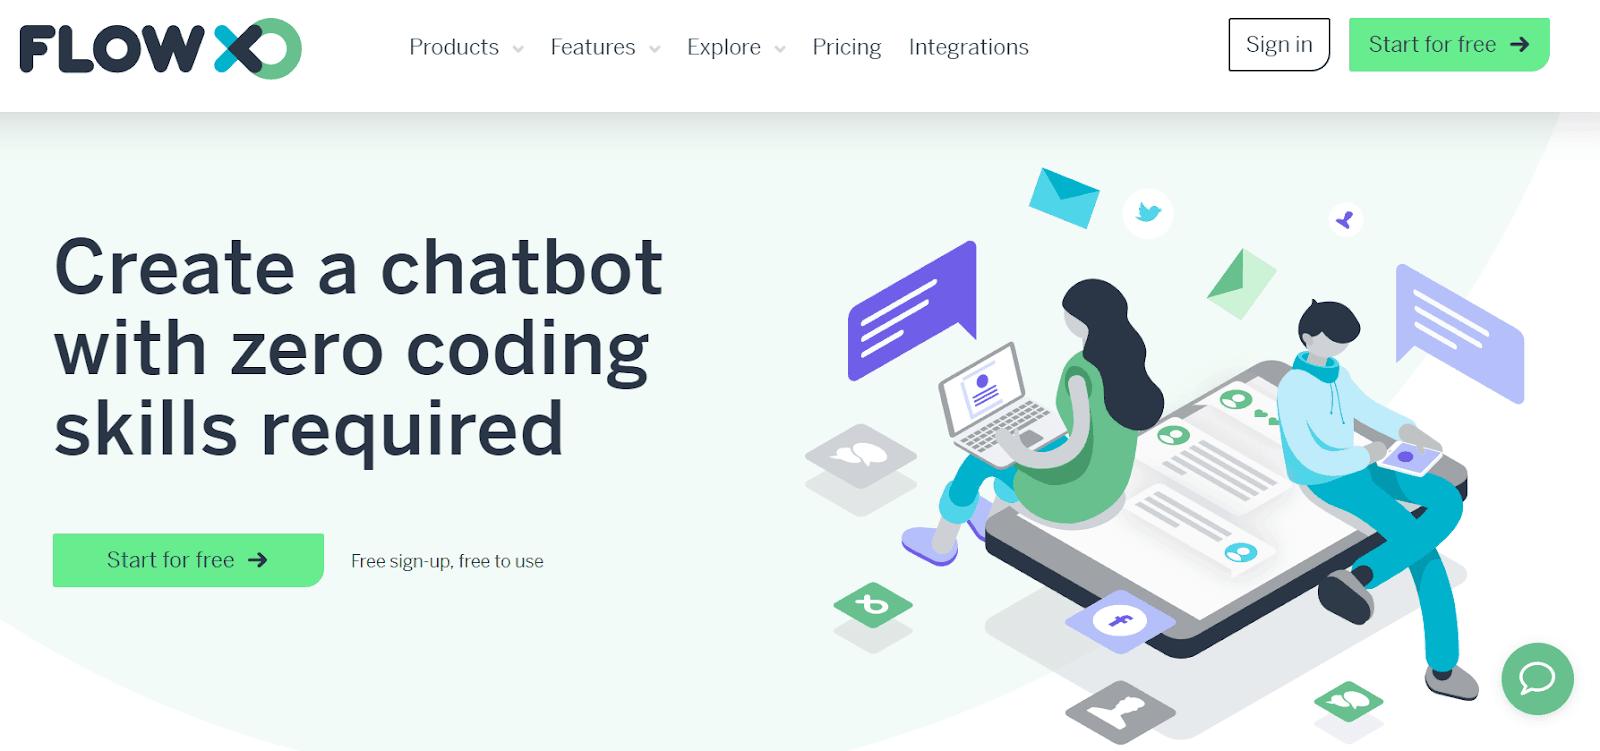 Flow XO Best AI Chatbot Platforms